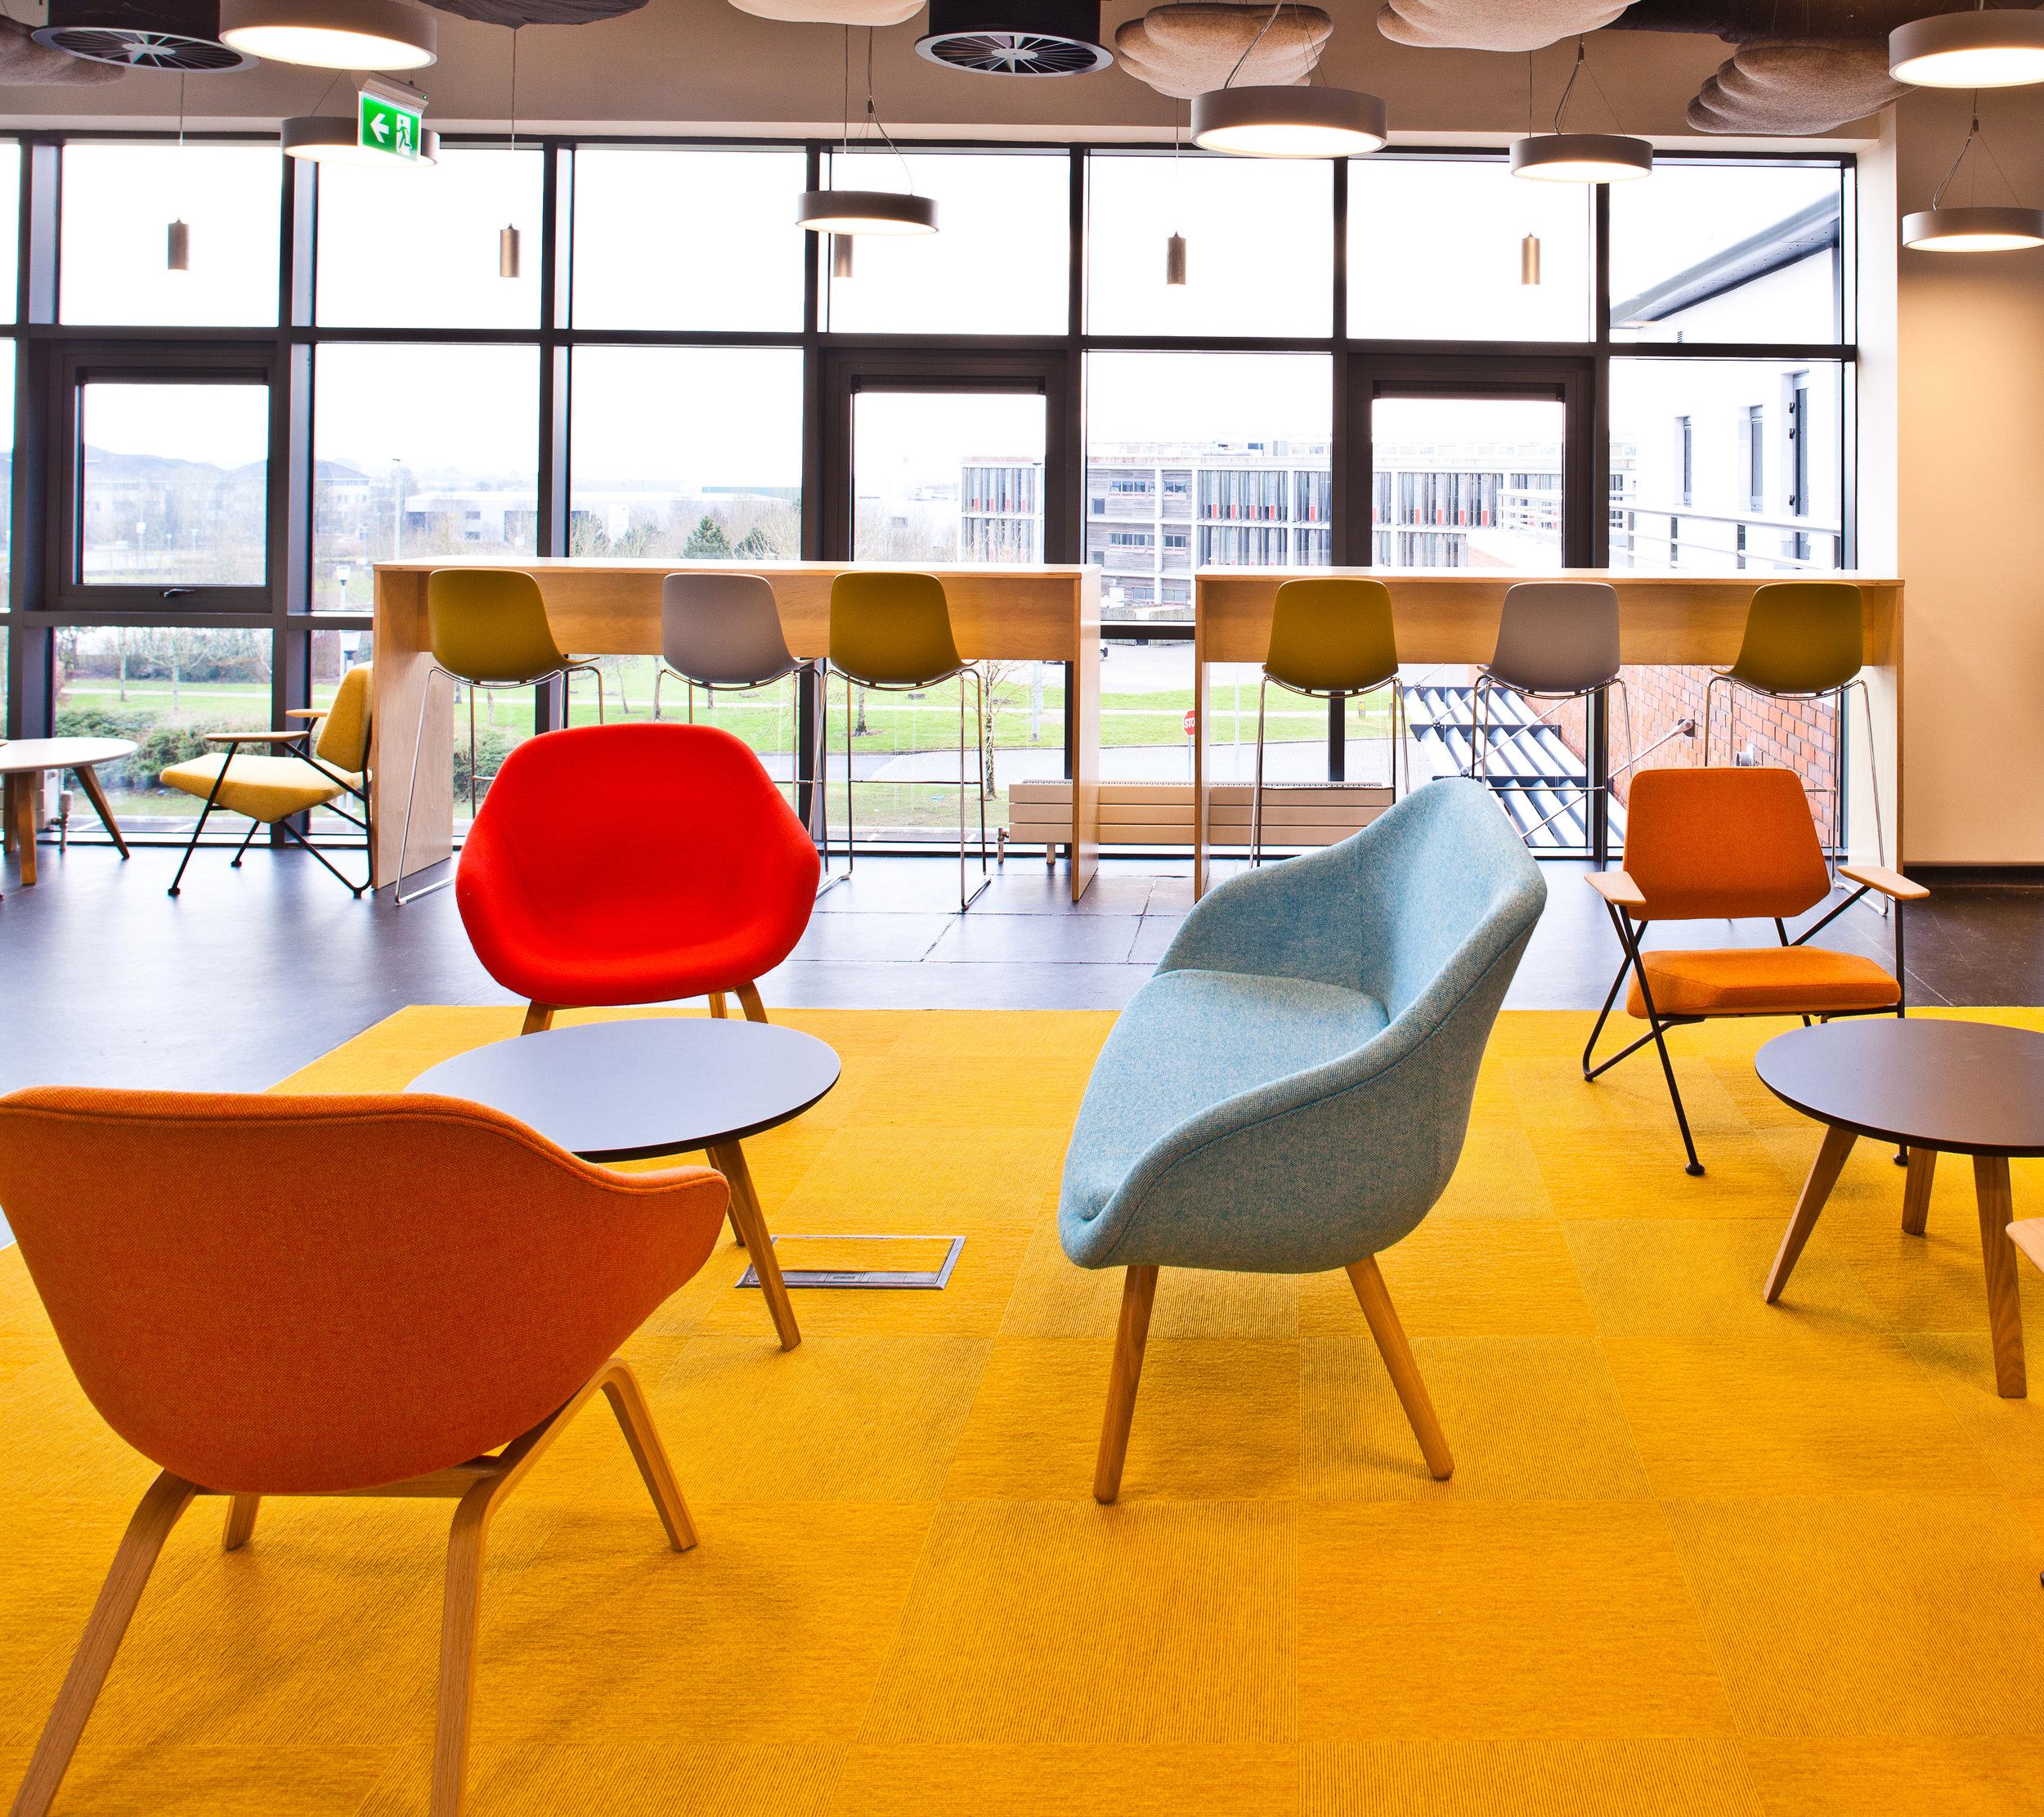 SAP Emer Block 4 - IDA Campus Parkmore - Canteen2.jpg